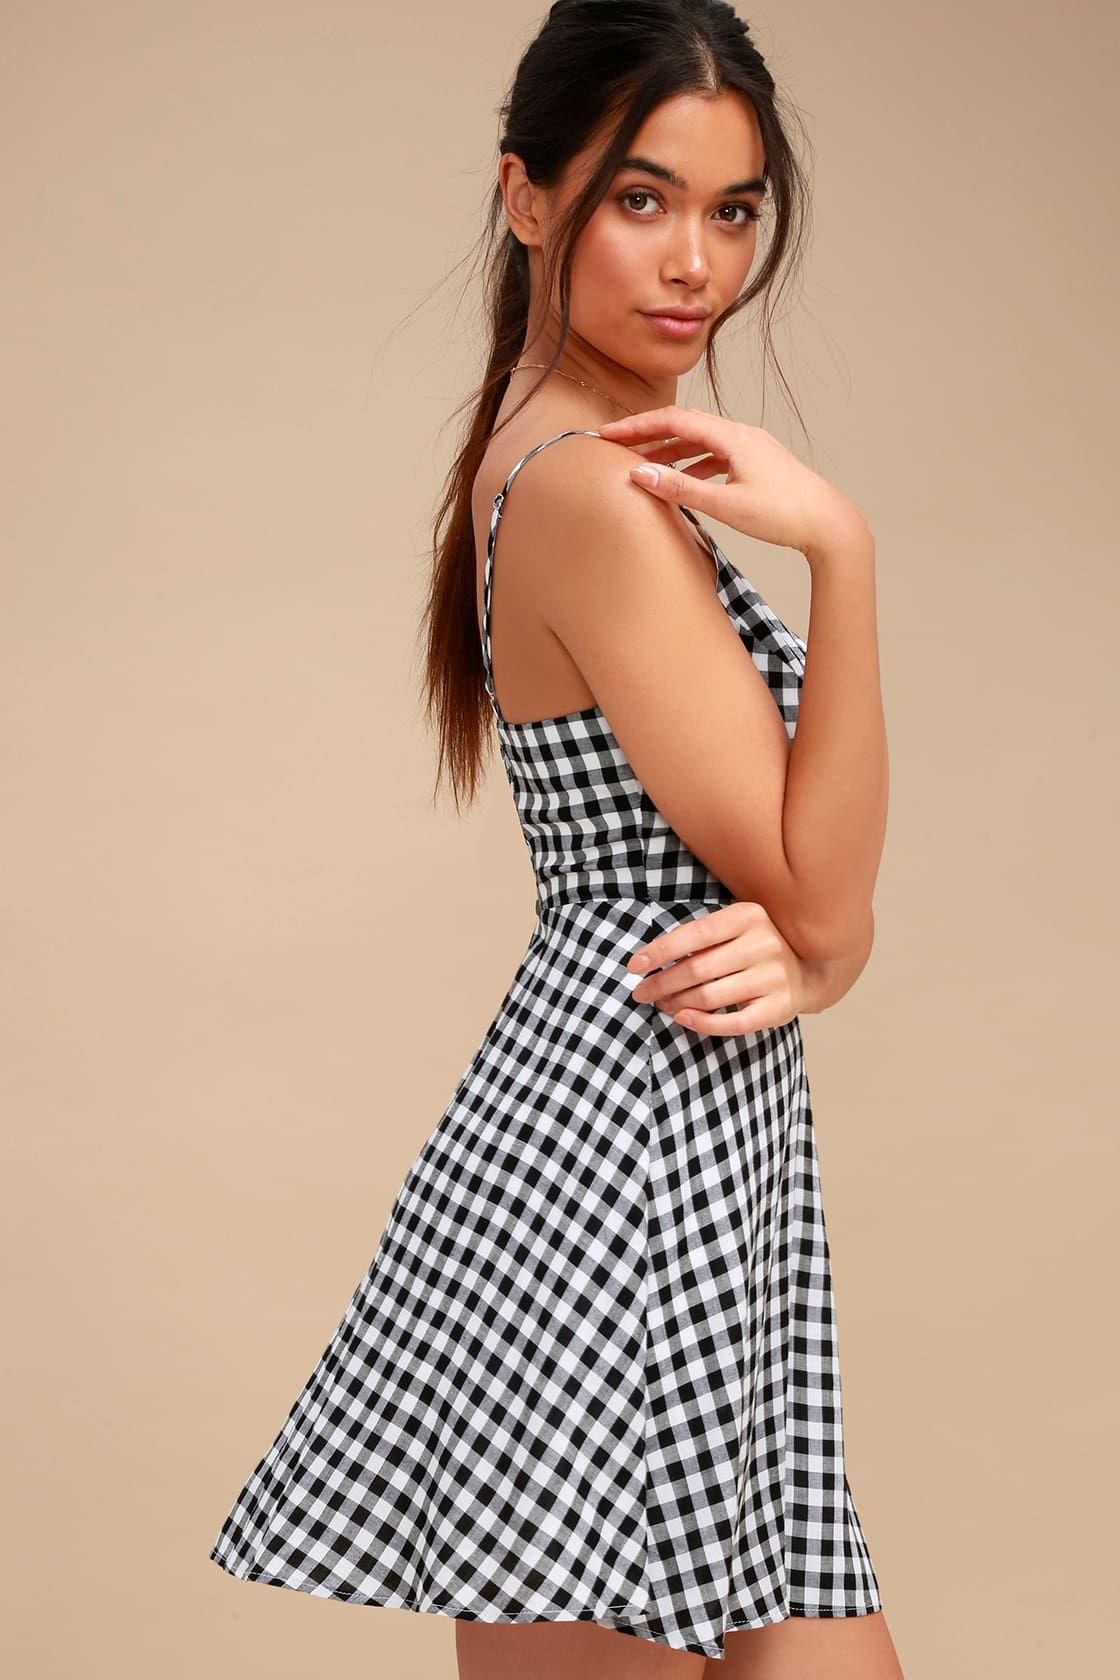 43fd5b3112c5 Plaid Romance Black and White Gingham Print Skater Dress | spring ...